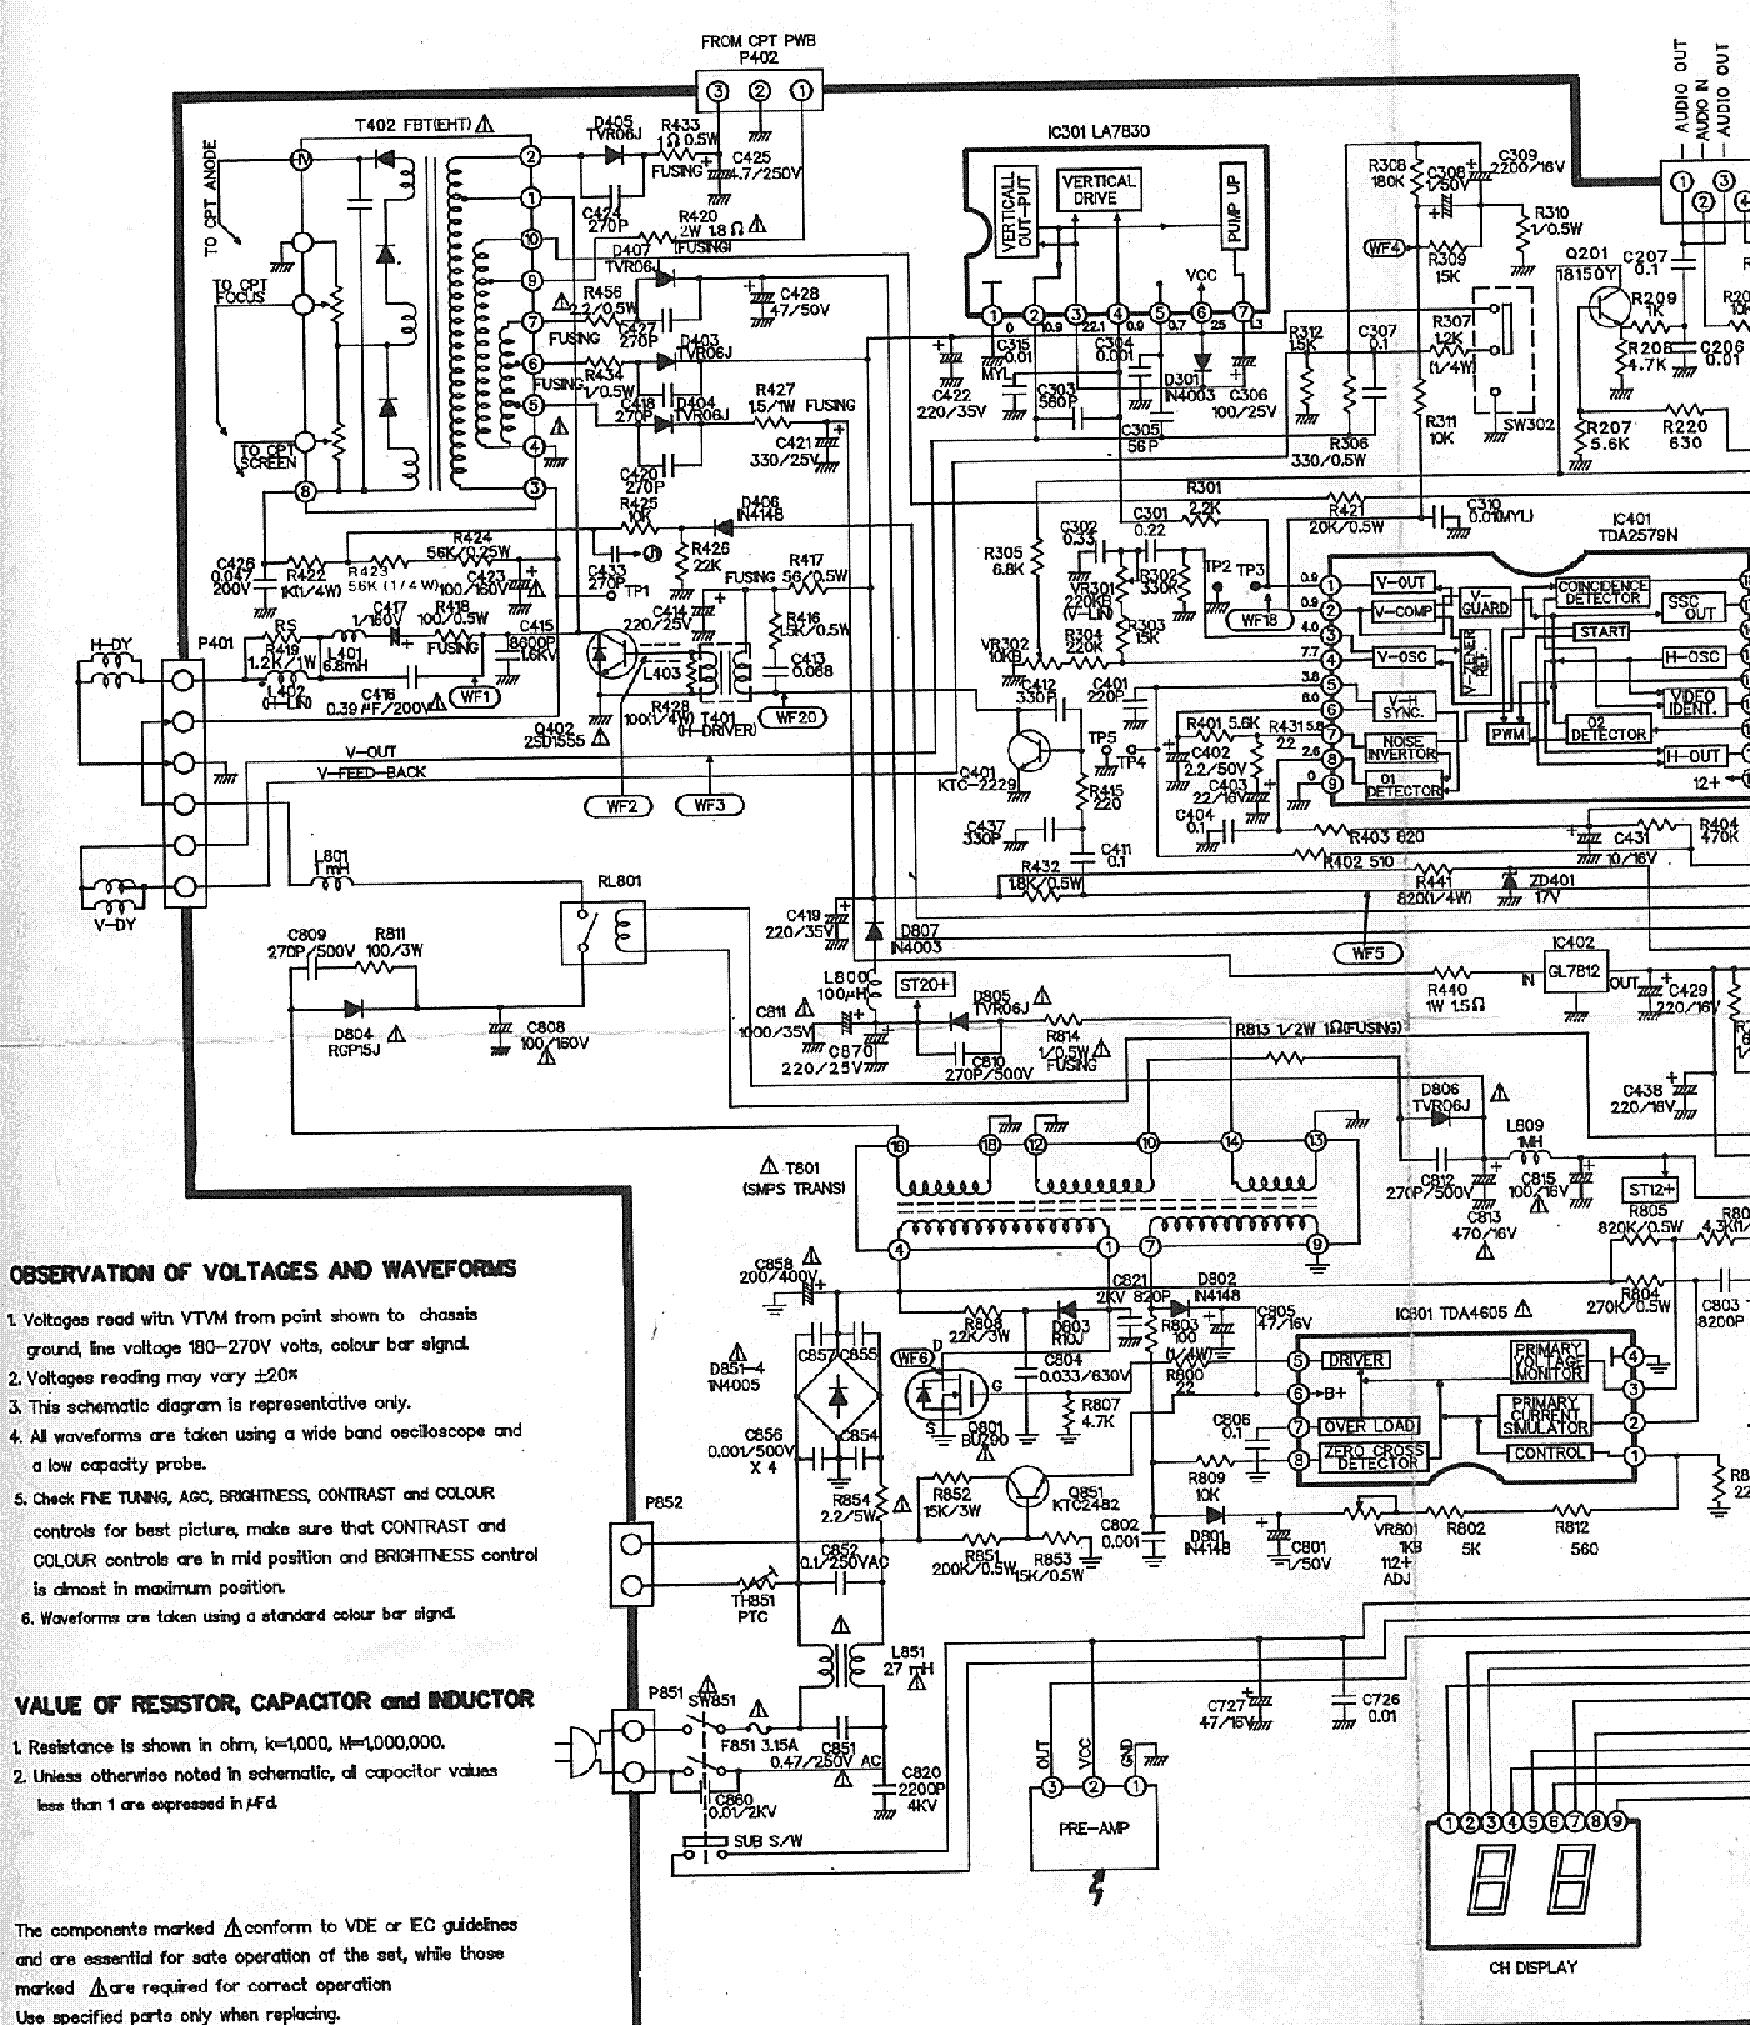 universum chassis 11ak03 sch service manual download  schematics  eeprom  repair info for